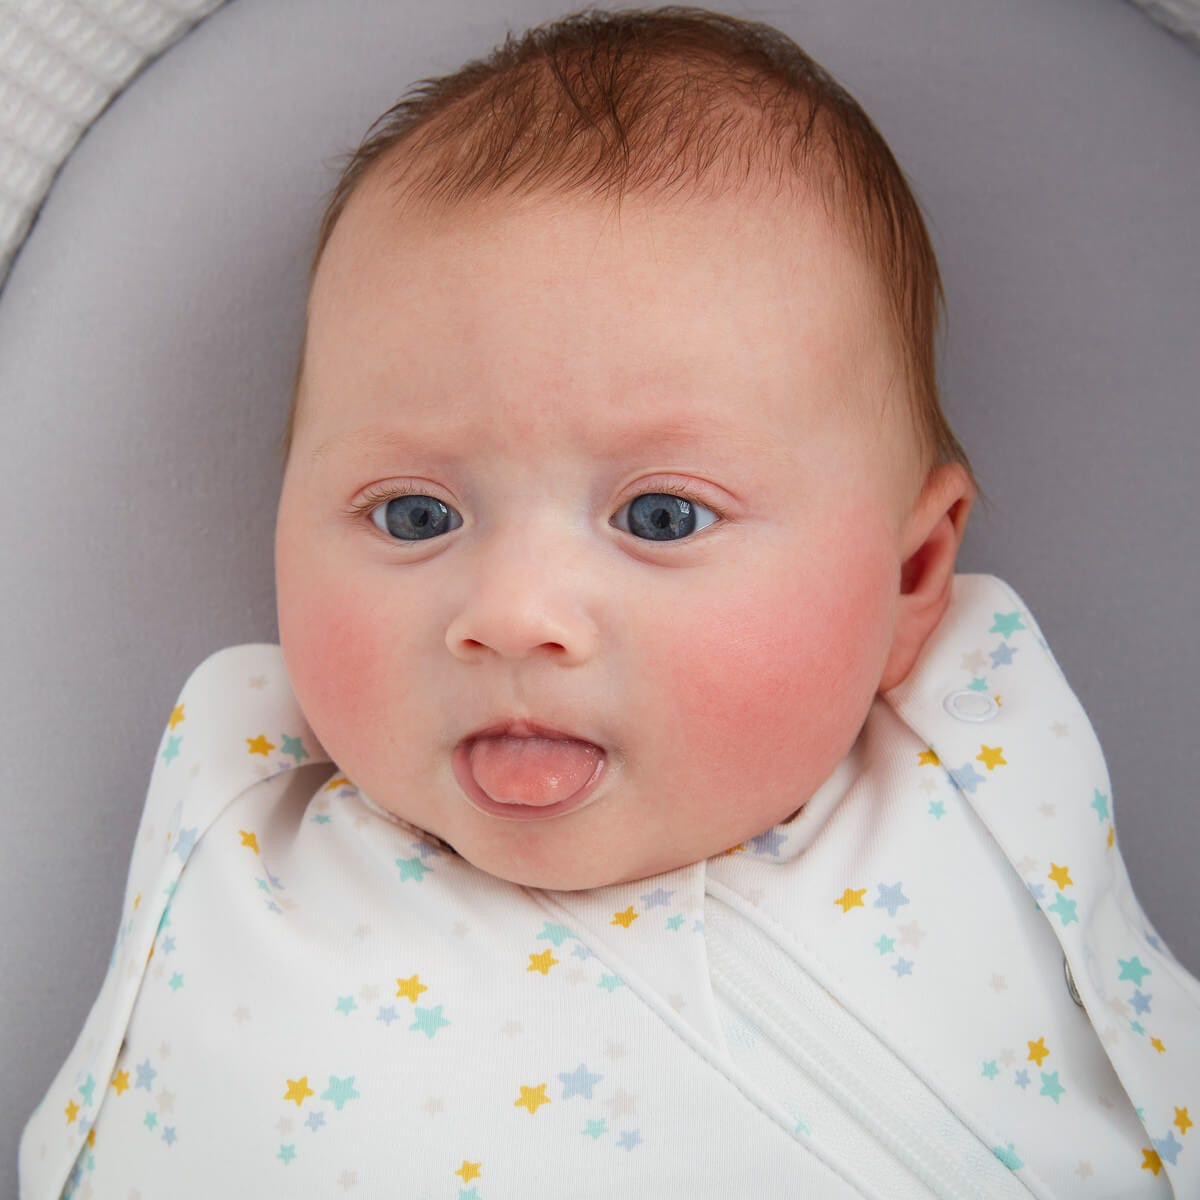 baby-in-sleepee-basket-wearing-stars-grosnug